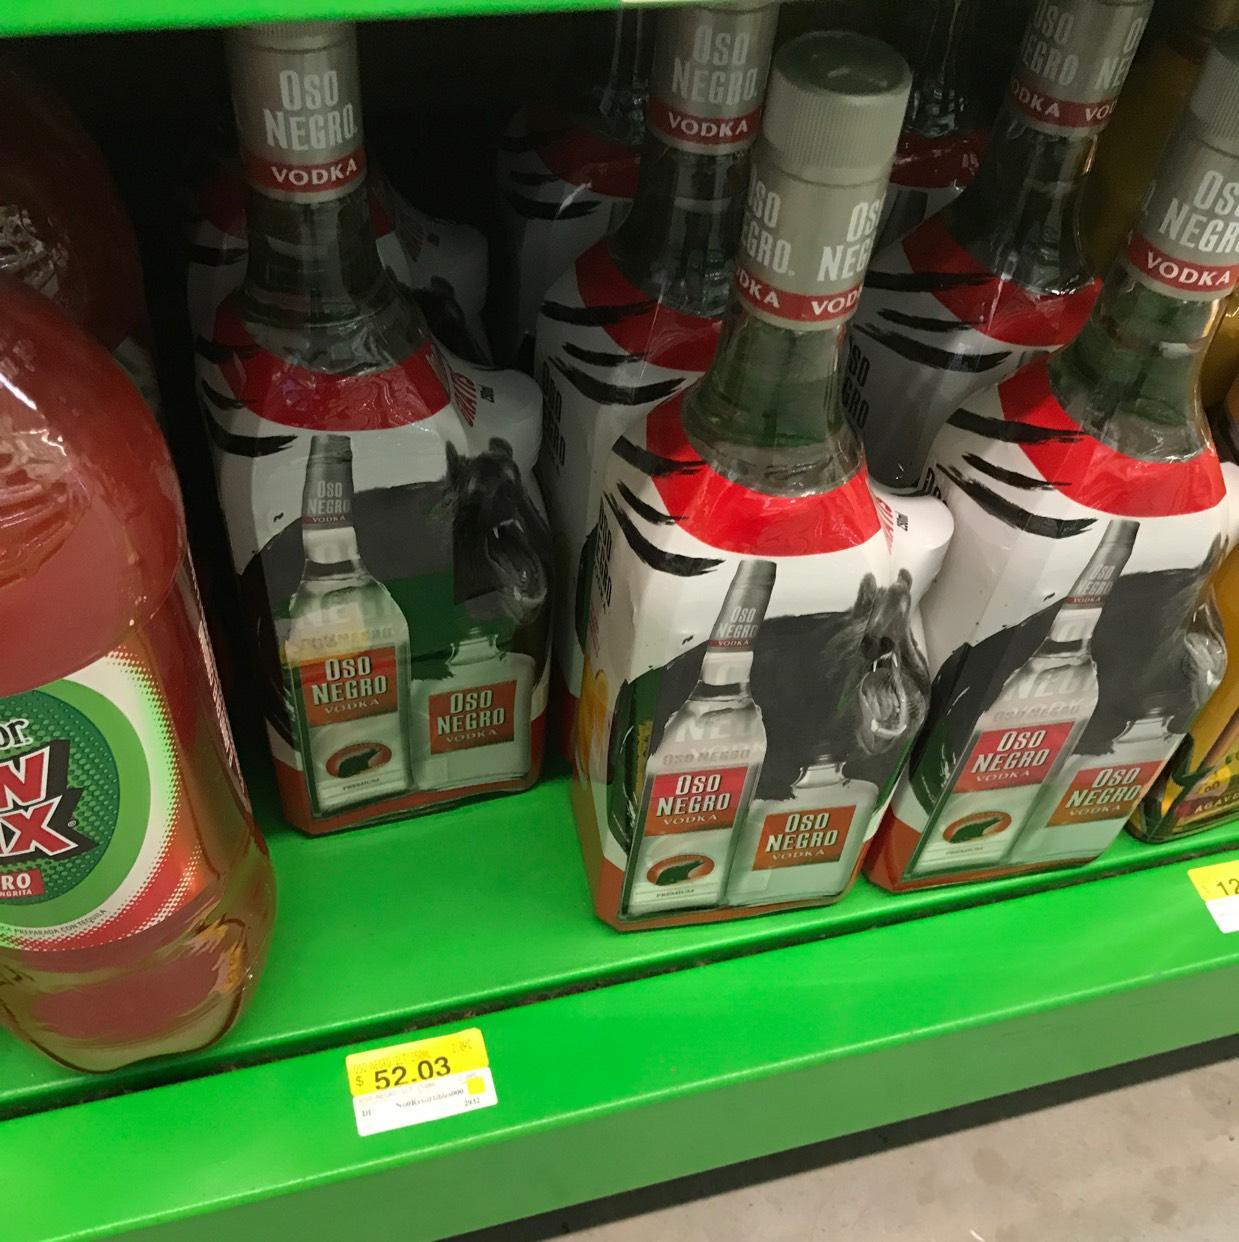 Bodega Aurrerá: Vodka Oso Negro 1 litro más pachita de 250ml